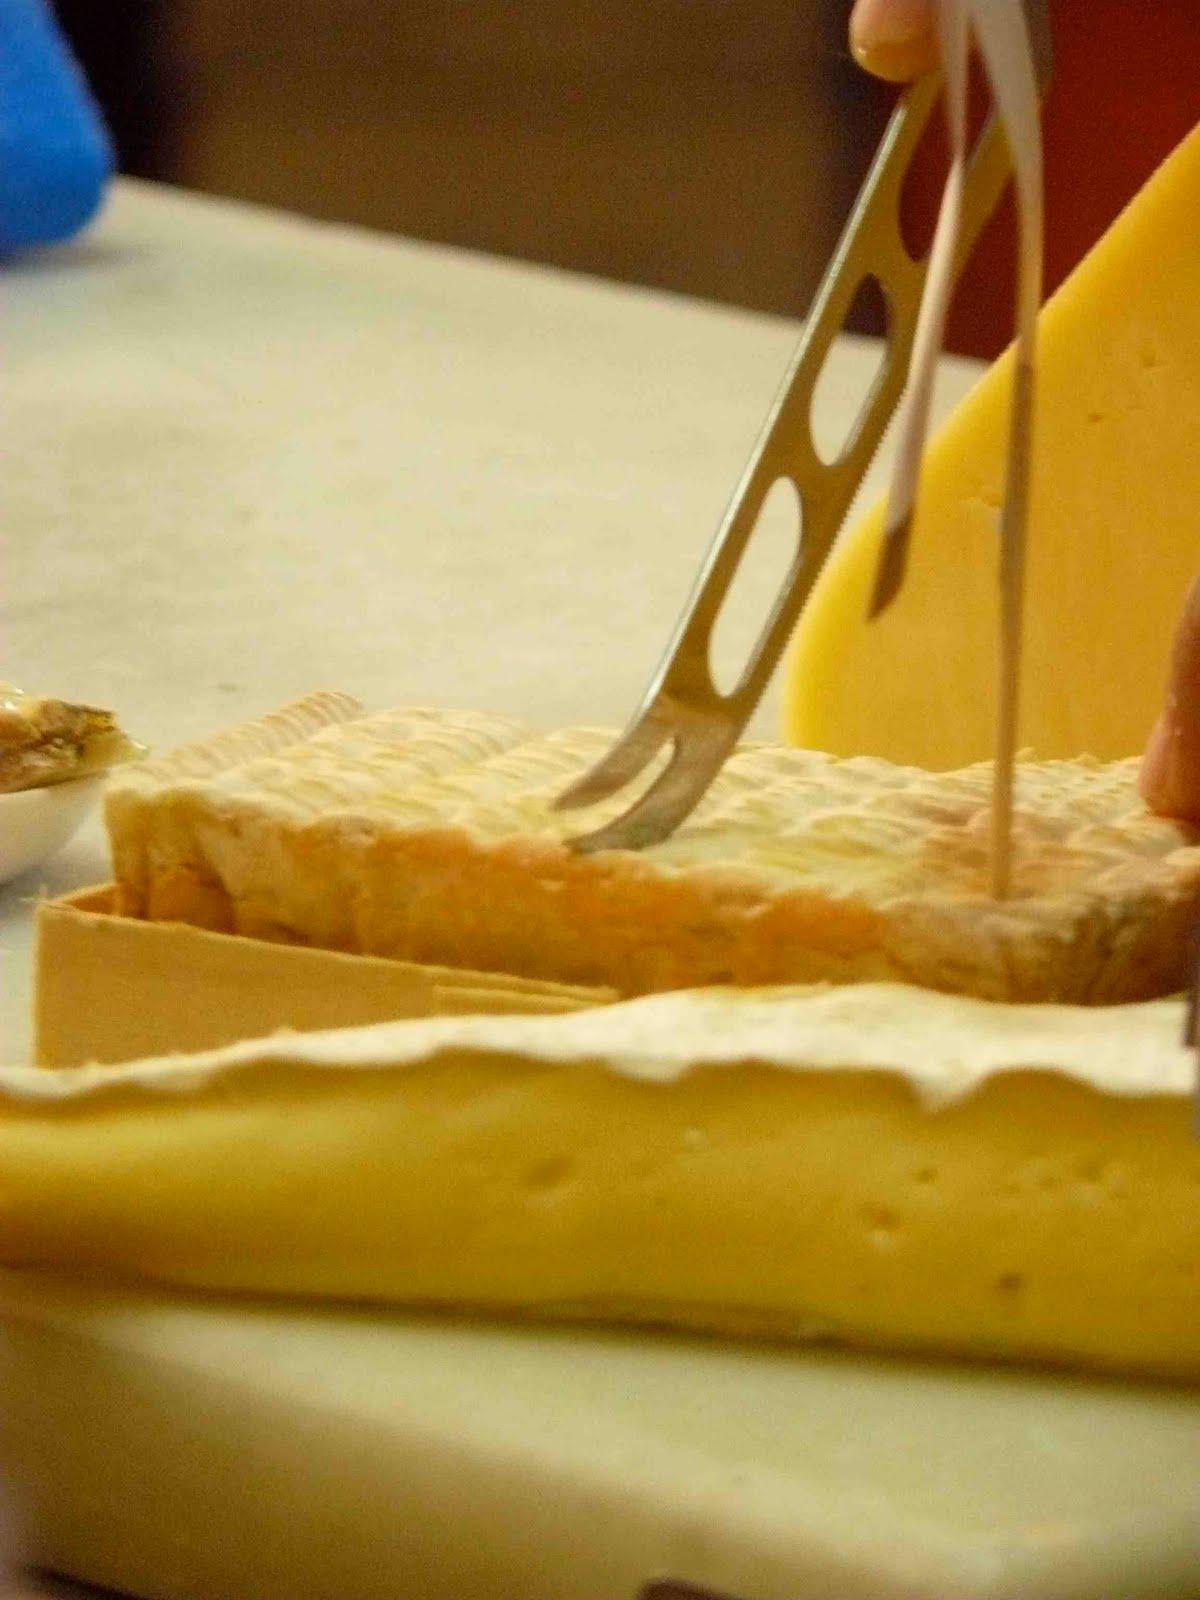 Romanescook blog clase magistral de quesos en casa vicent - Cuchillo cortar queso ...